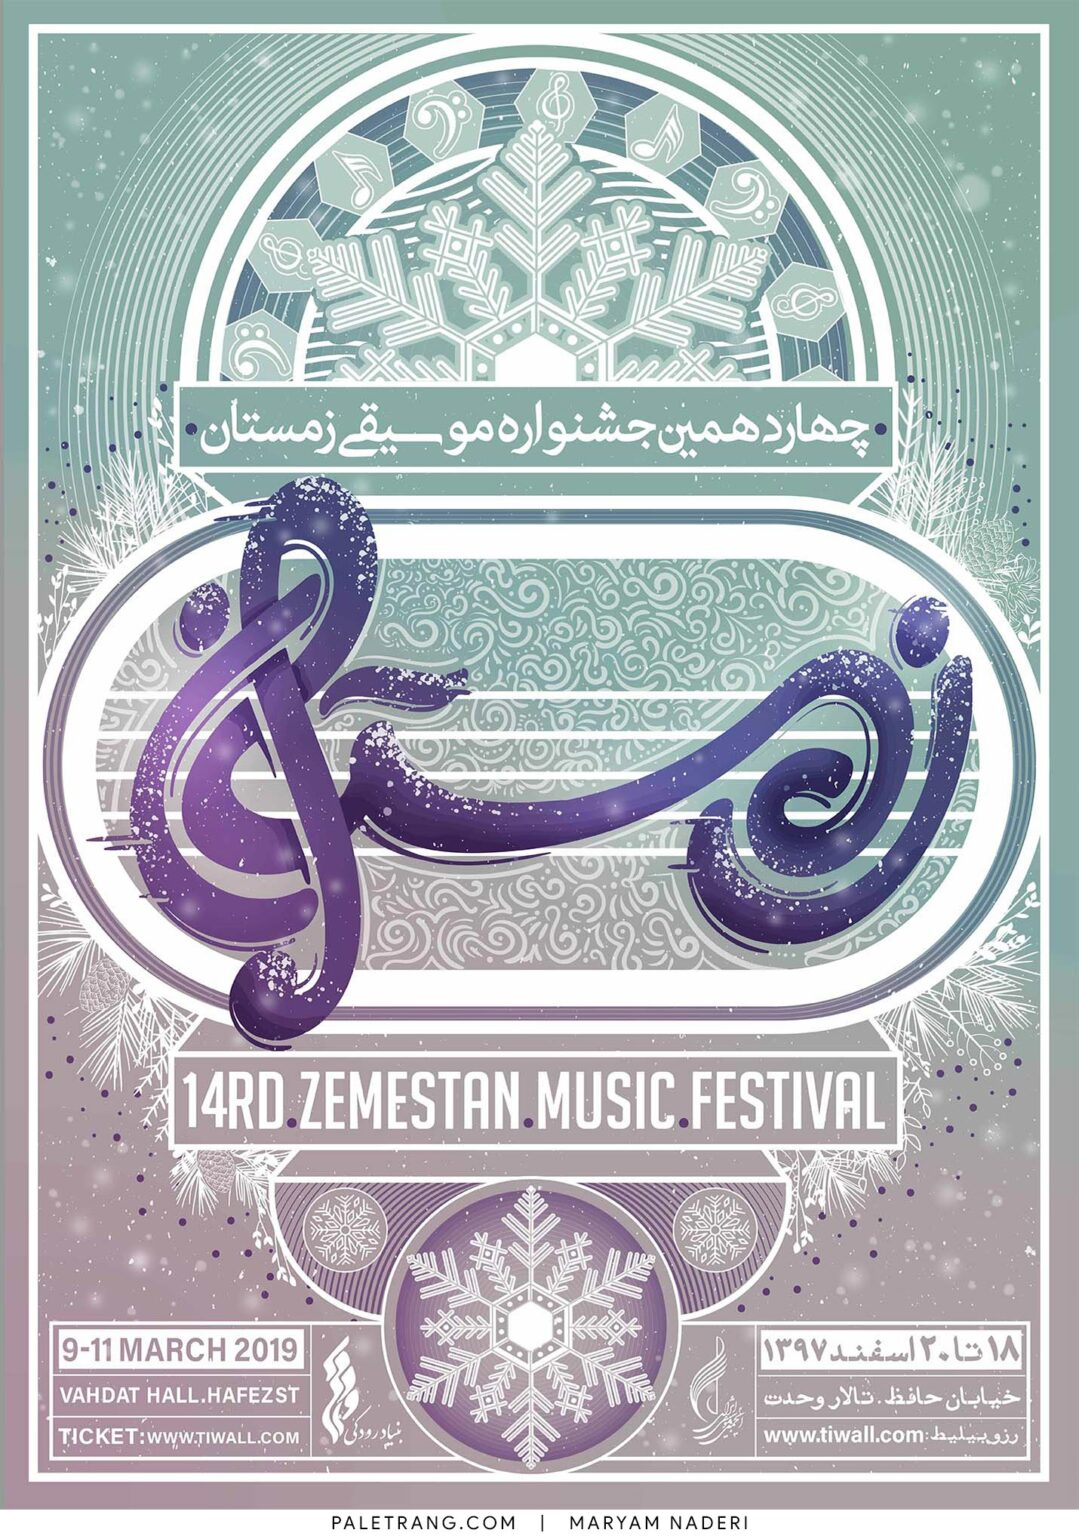 پوستر چهارمین جشنواره موسیقی زمستان اثر مریم نادری